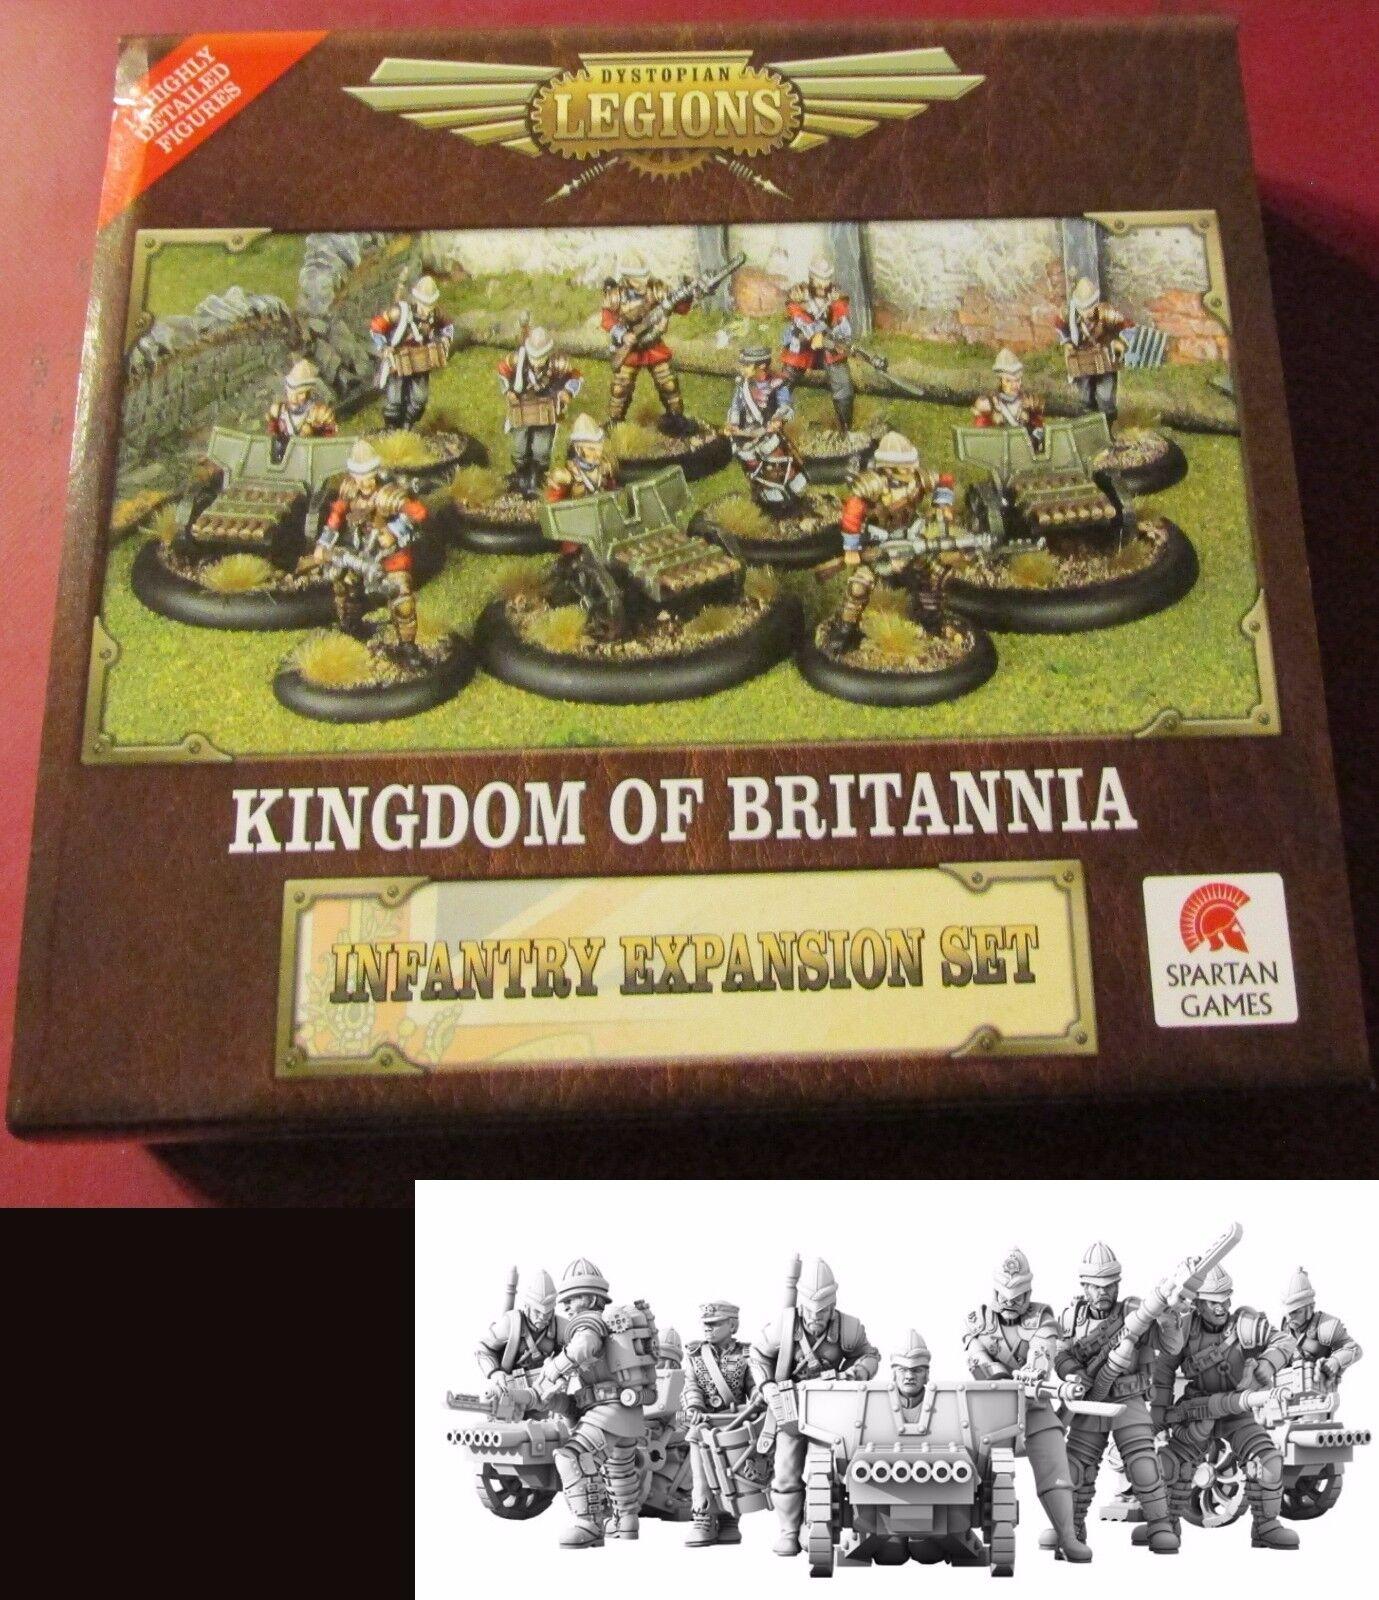 Dystopian Legions DLKB43 Kingdom of Britannia Infantry Expansion Set Weapon Team